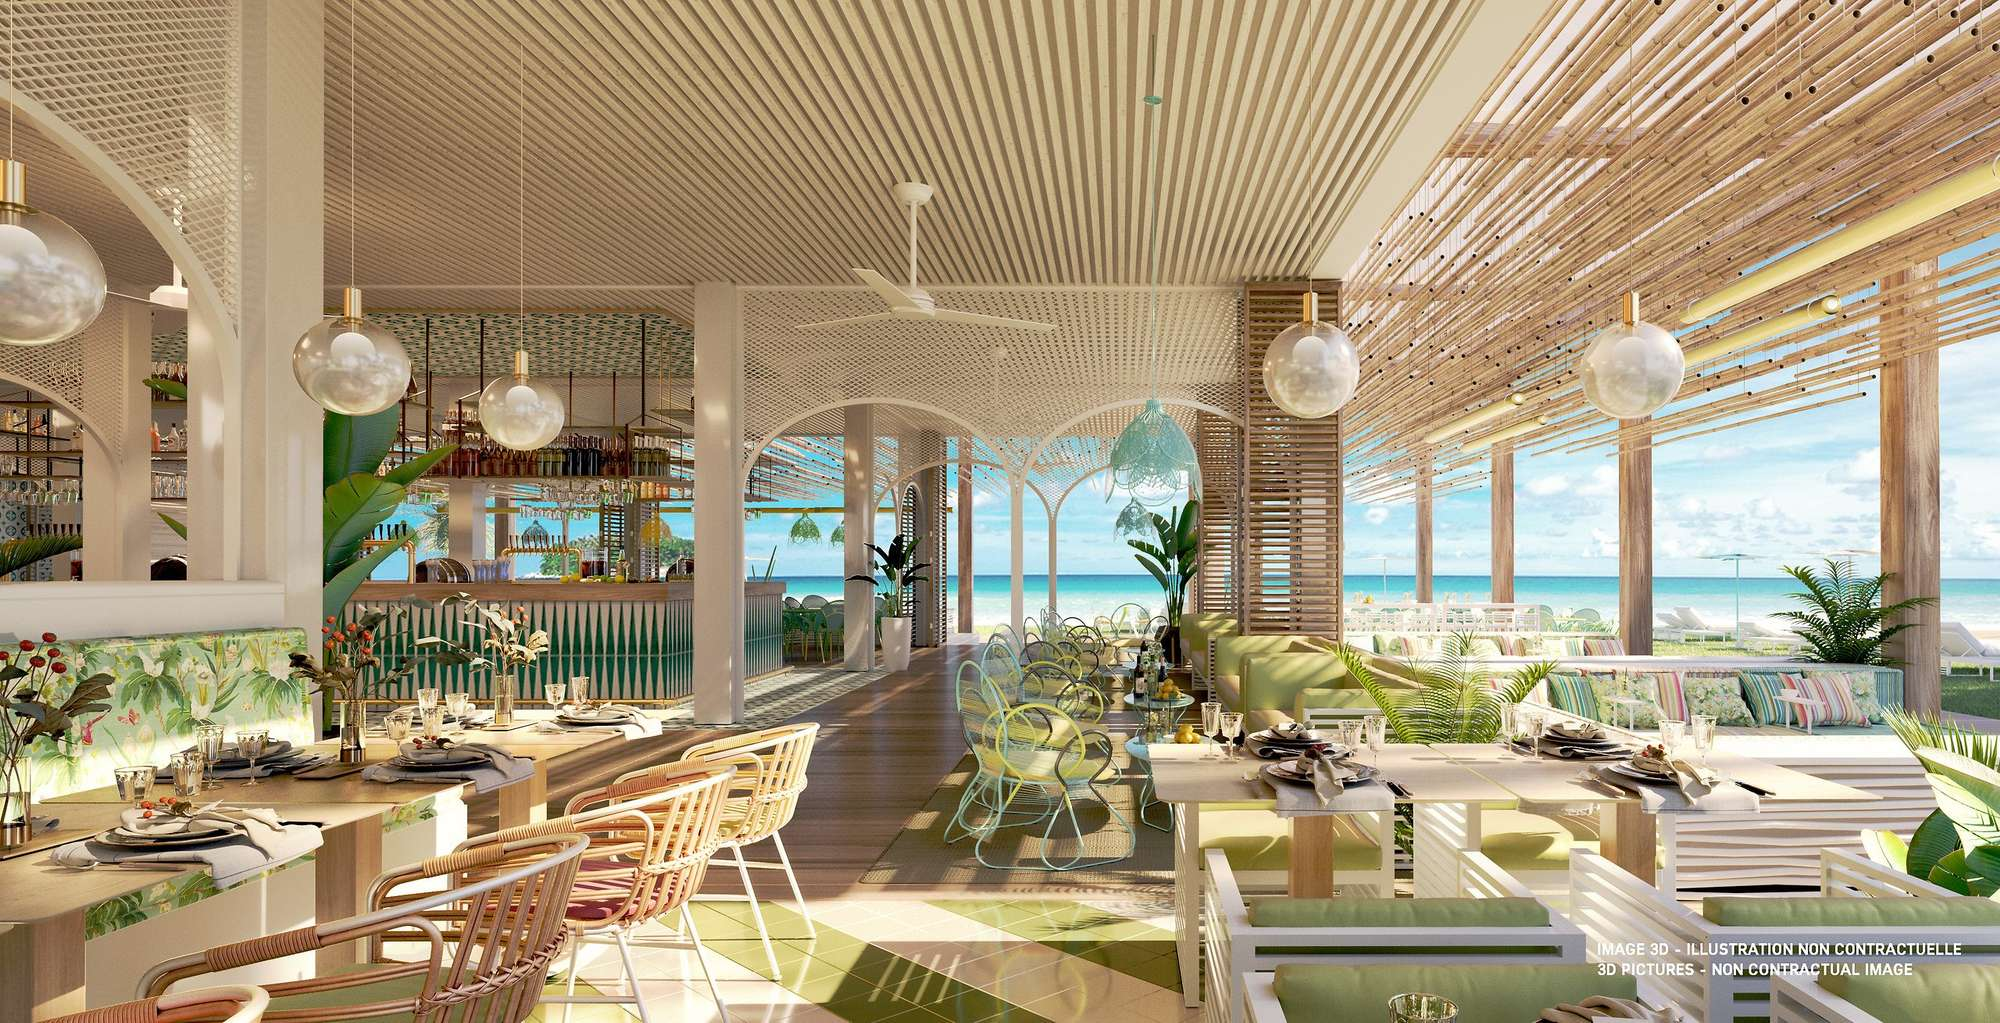 https___ns.clubmed.com_dream_EXCLUSIVE_COLLECTION_Resorts_Miches_Playa_Esmeralda_182725-9ornnia92y-swhr